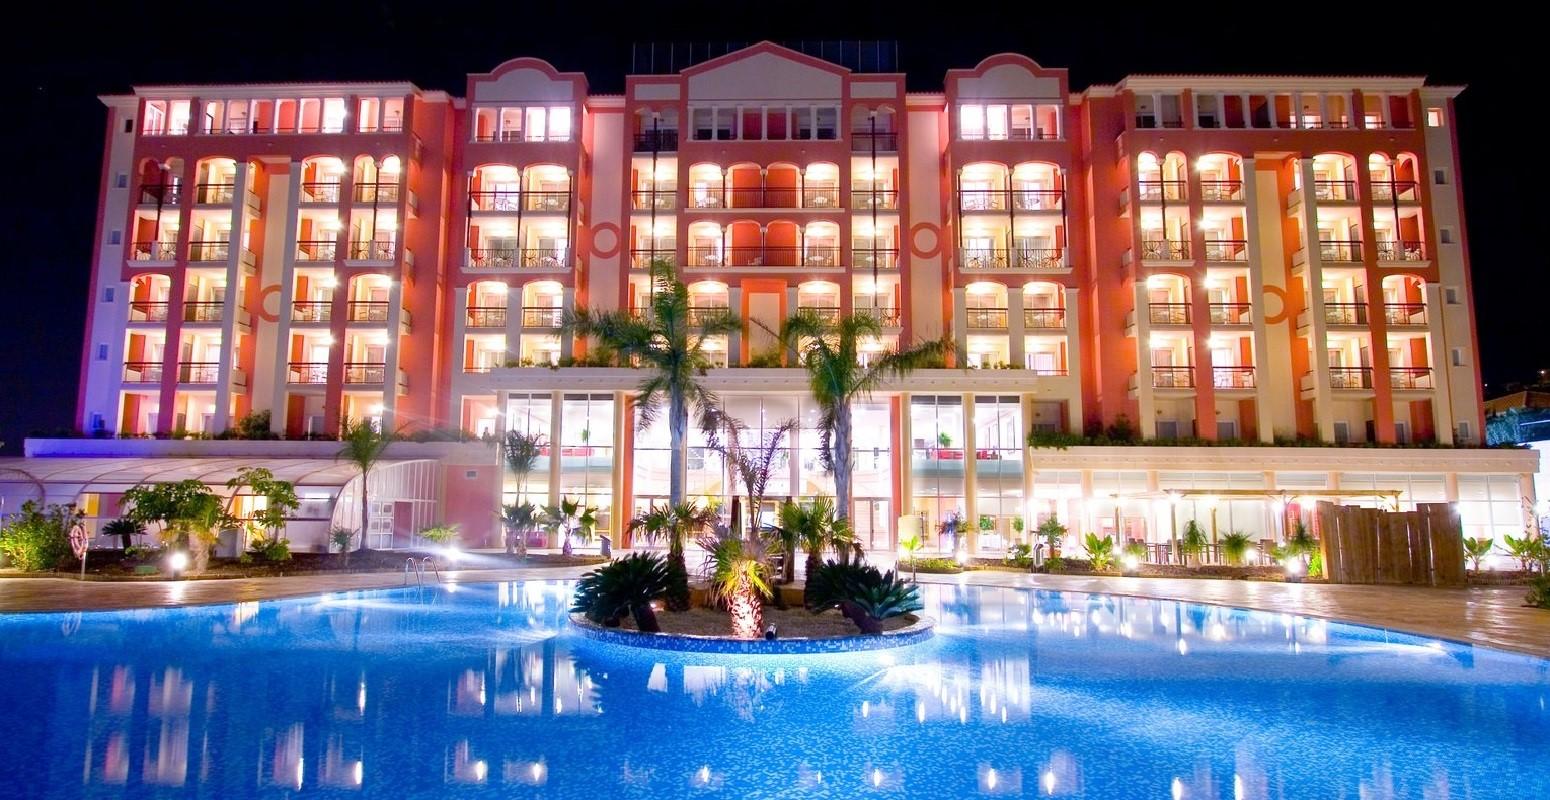 hotel Bonalba san juan alicante